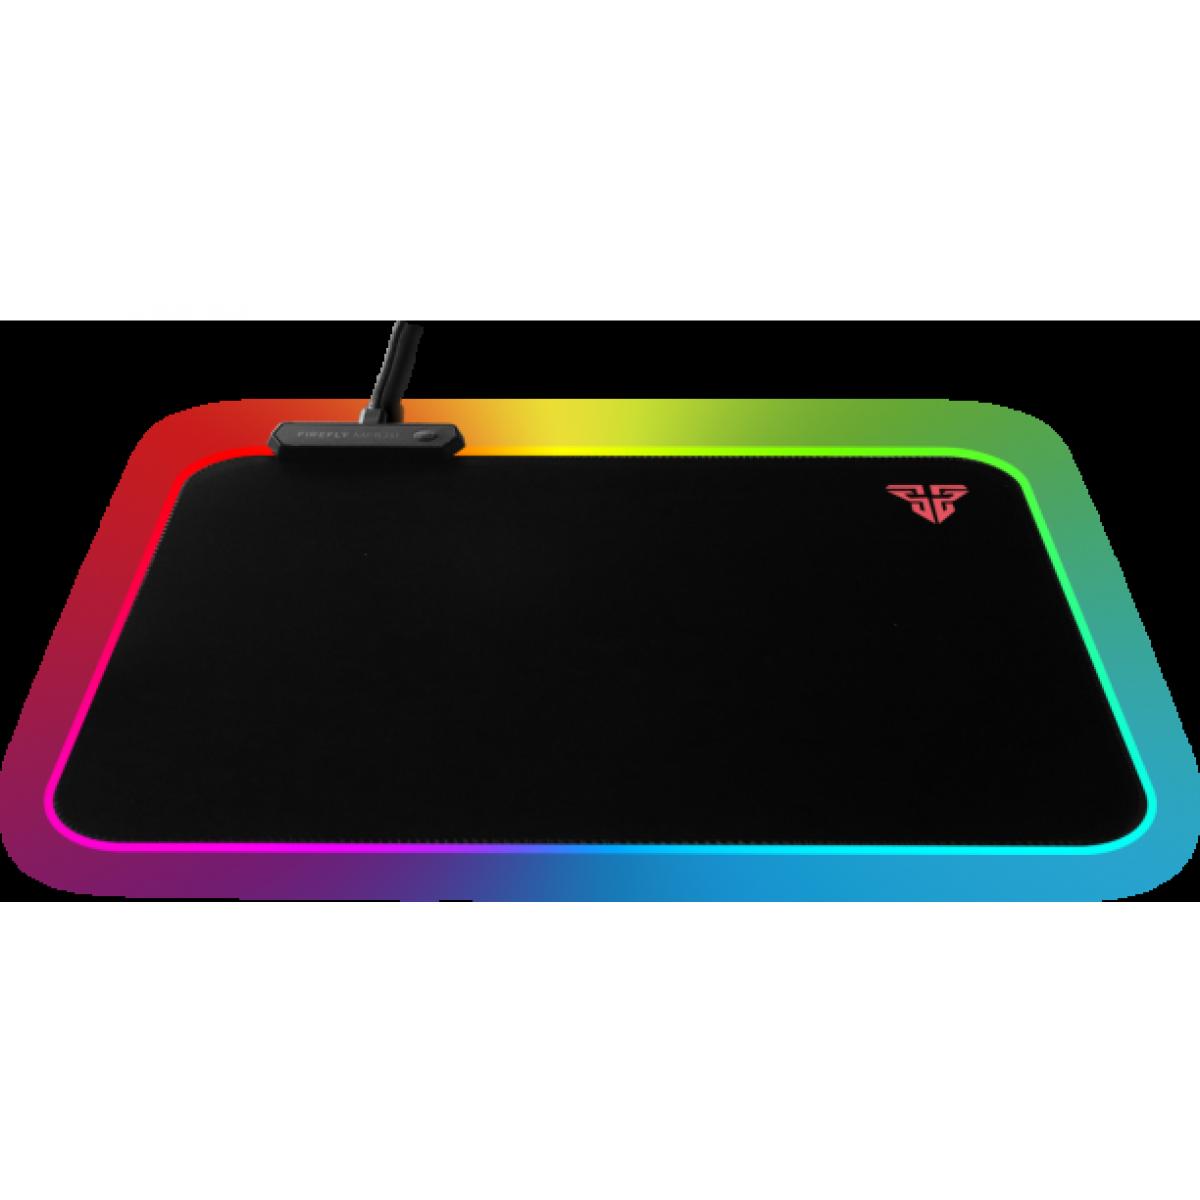 Mousepad Gamer Fantech Firefly, Black, RGB, 350x250mm, MPR351s